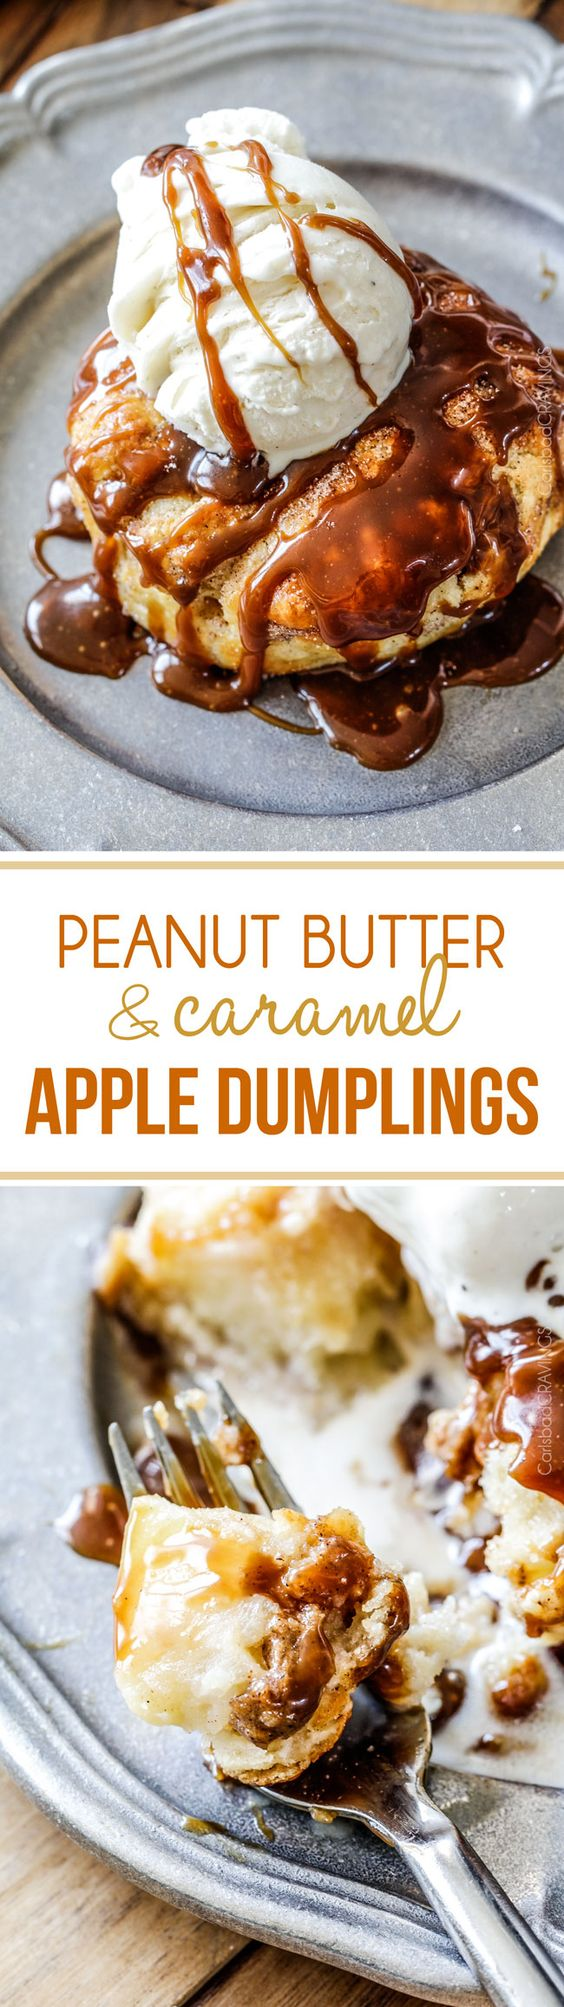 Peanut Butter and Caramel Apple Dumplings AKA the best apple dumplings ...